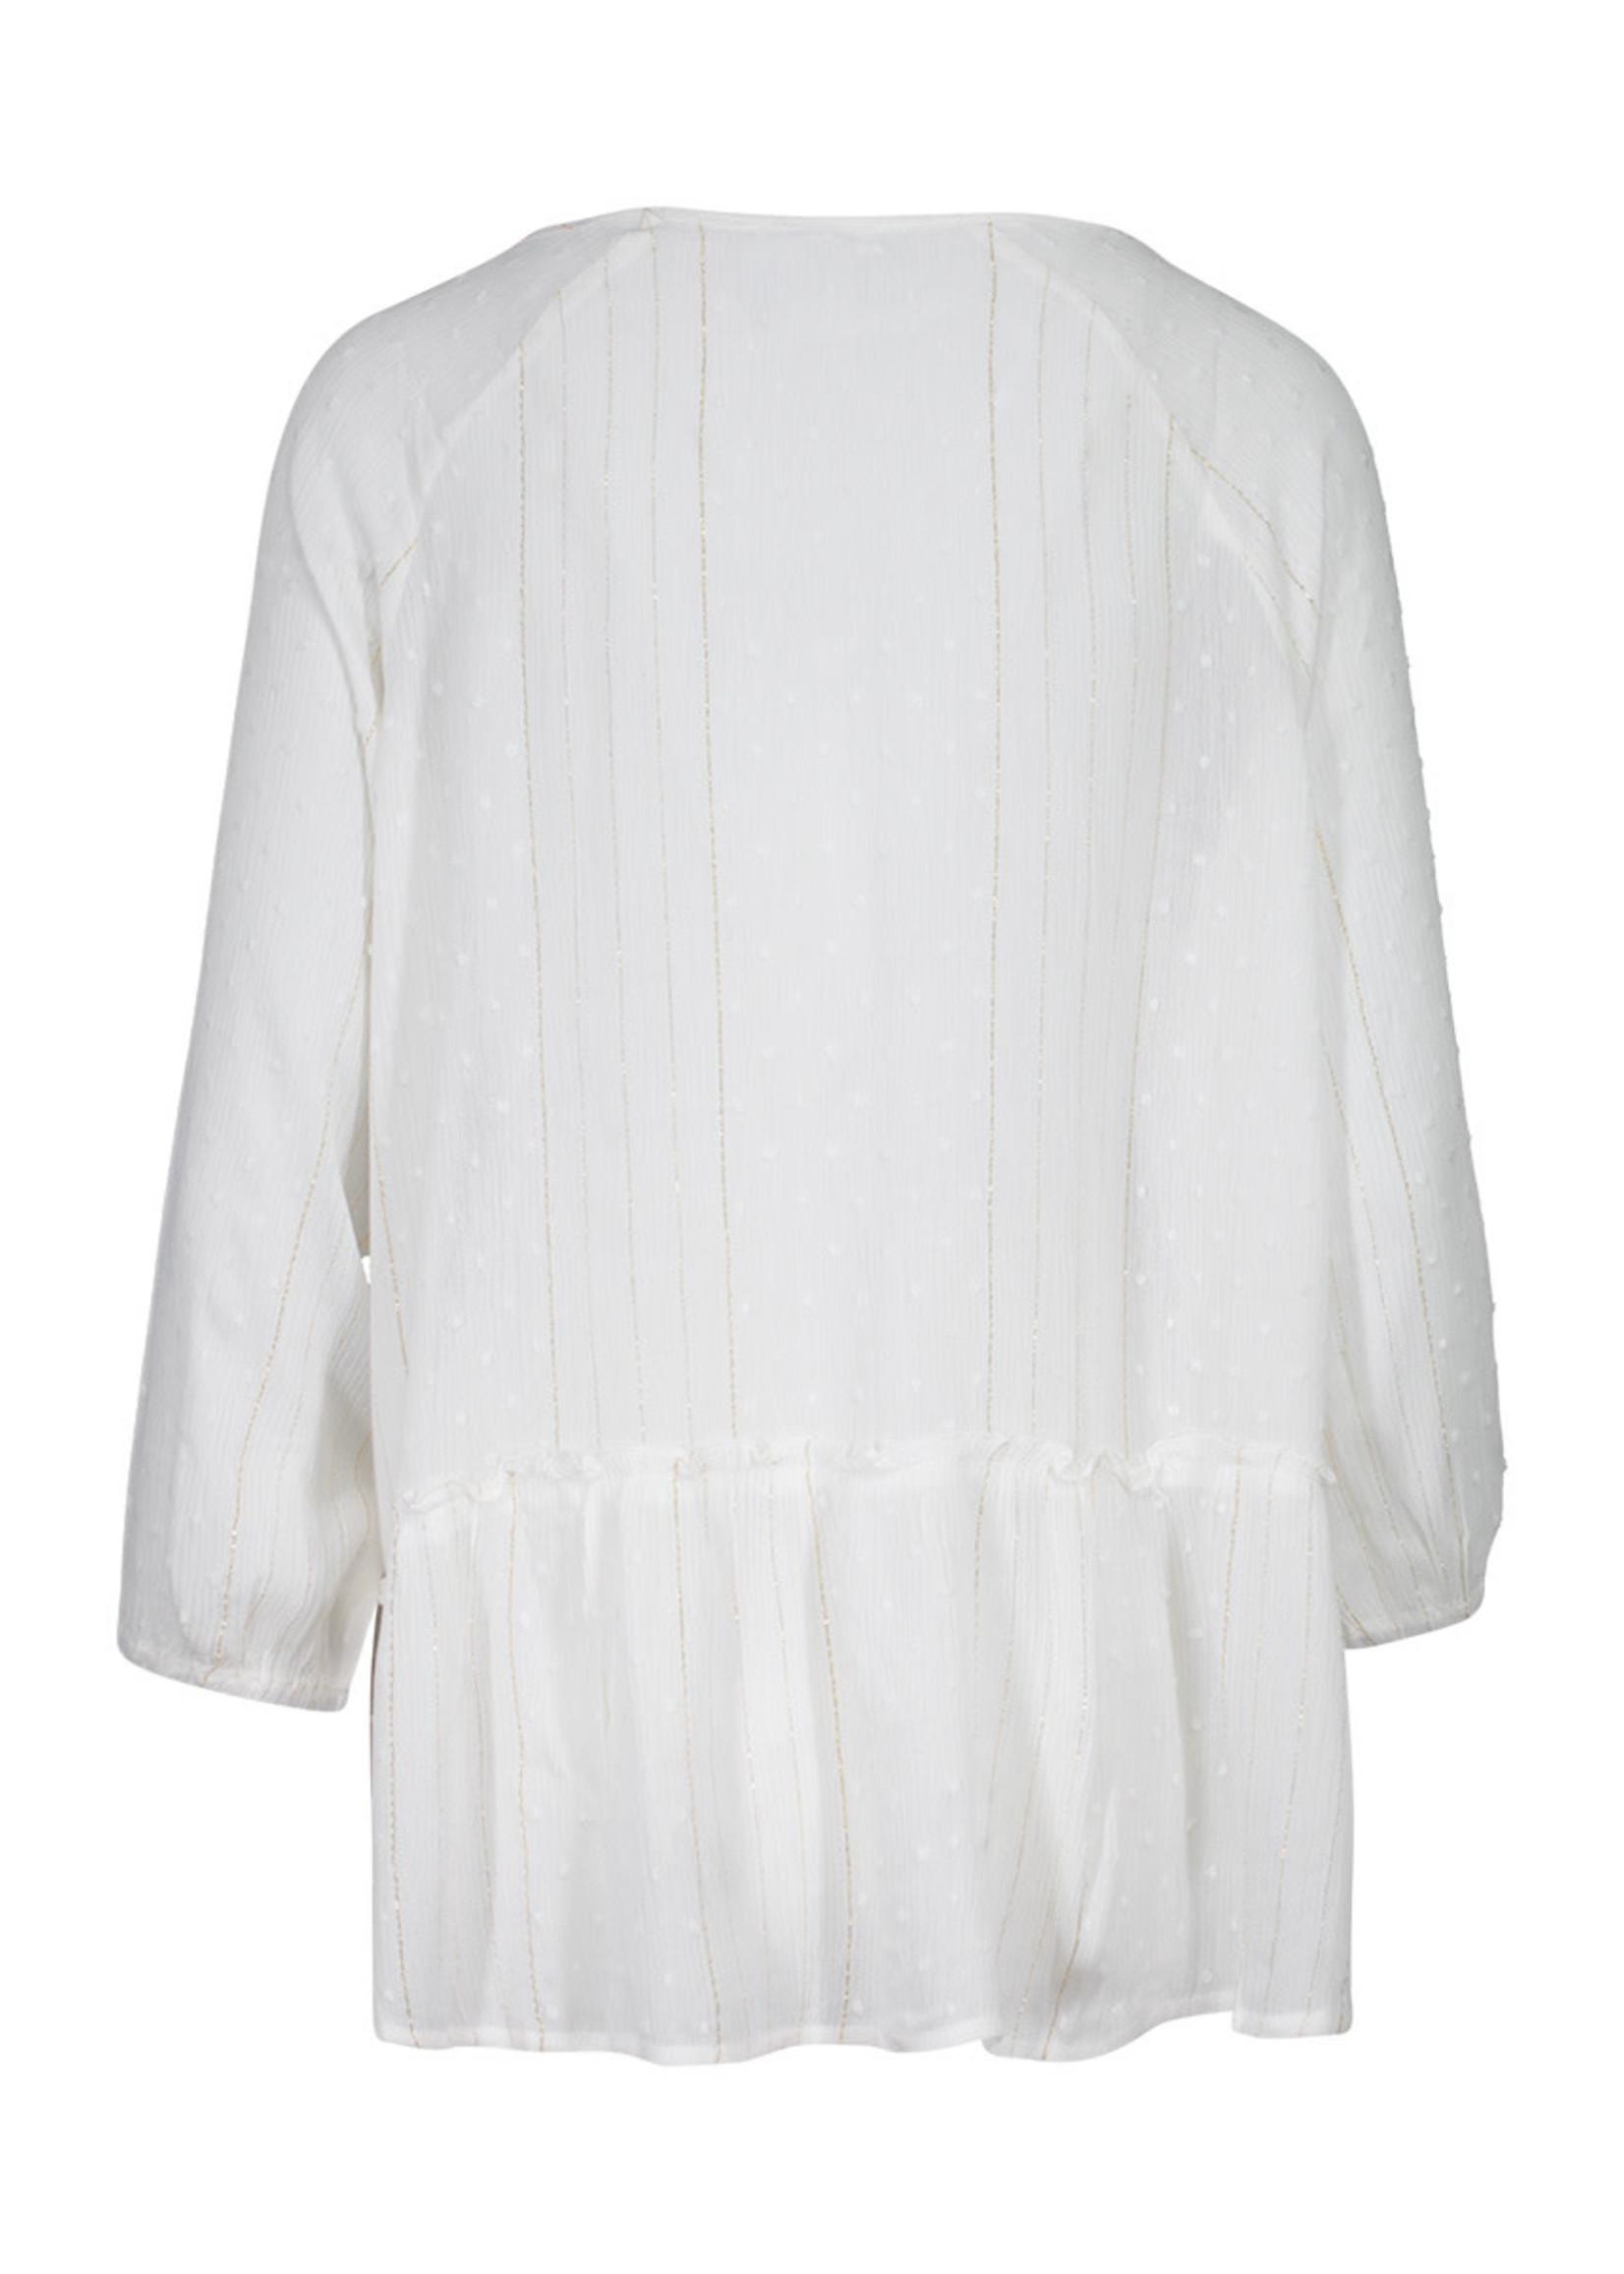 3/4 Sleeve Raglan Sleeve Blouse